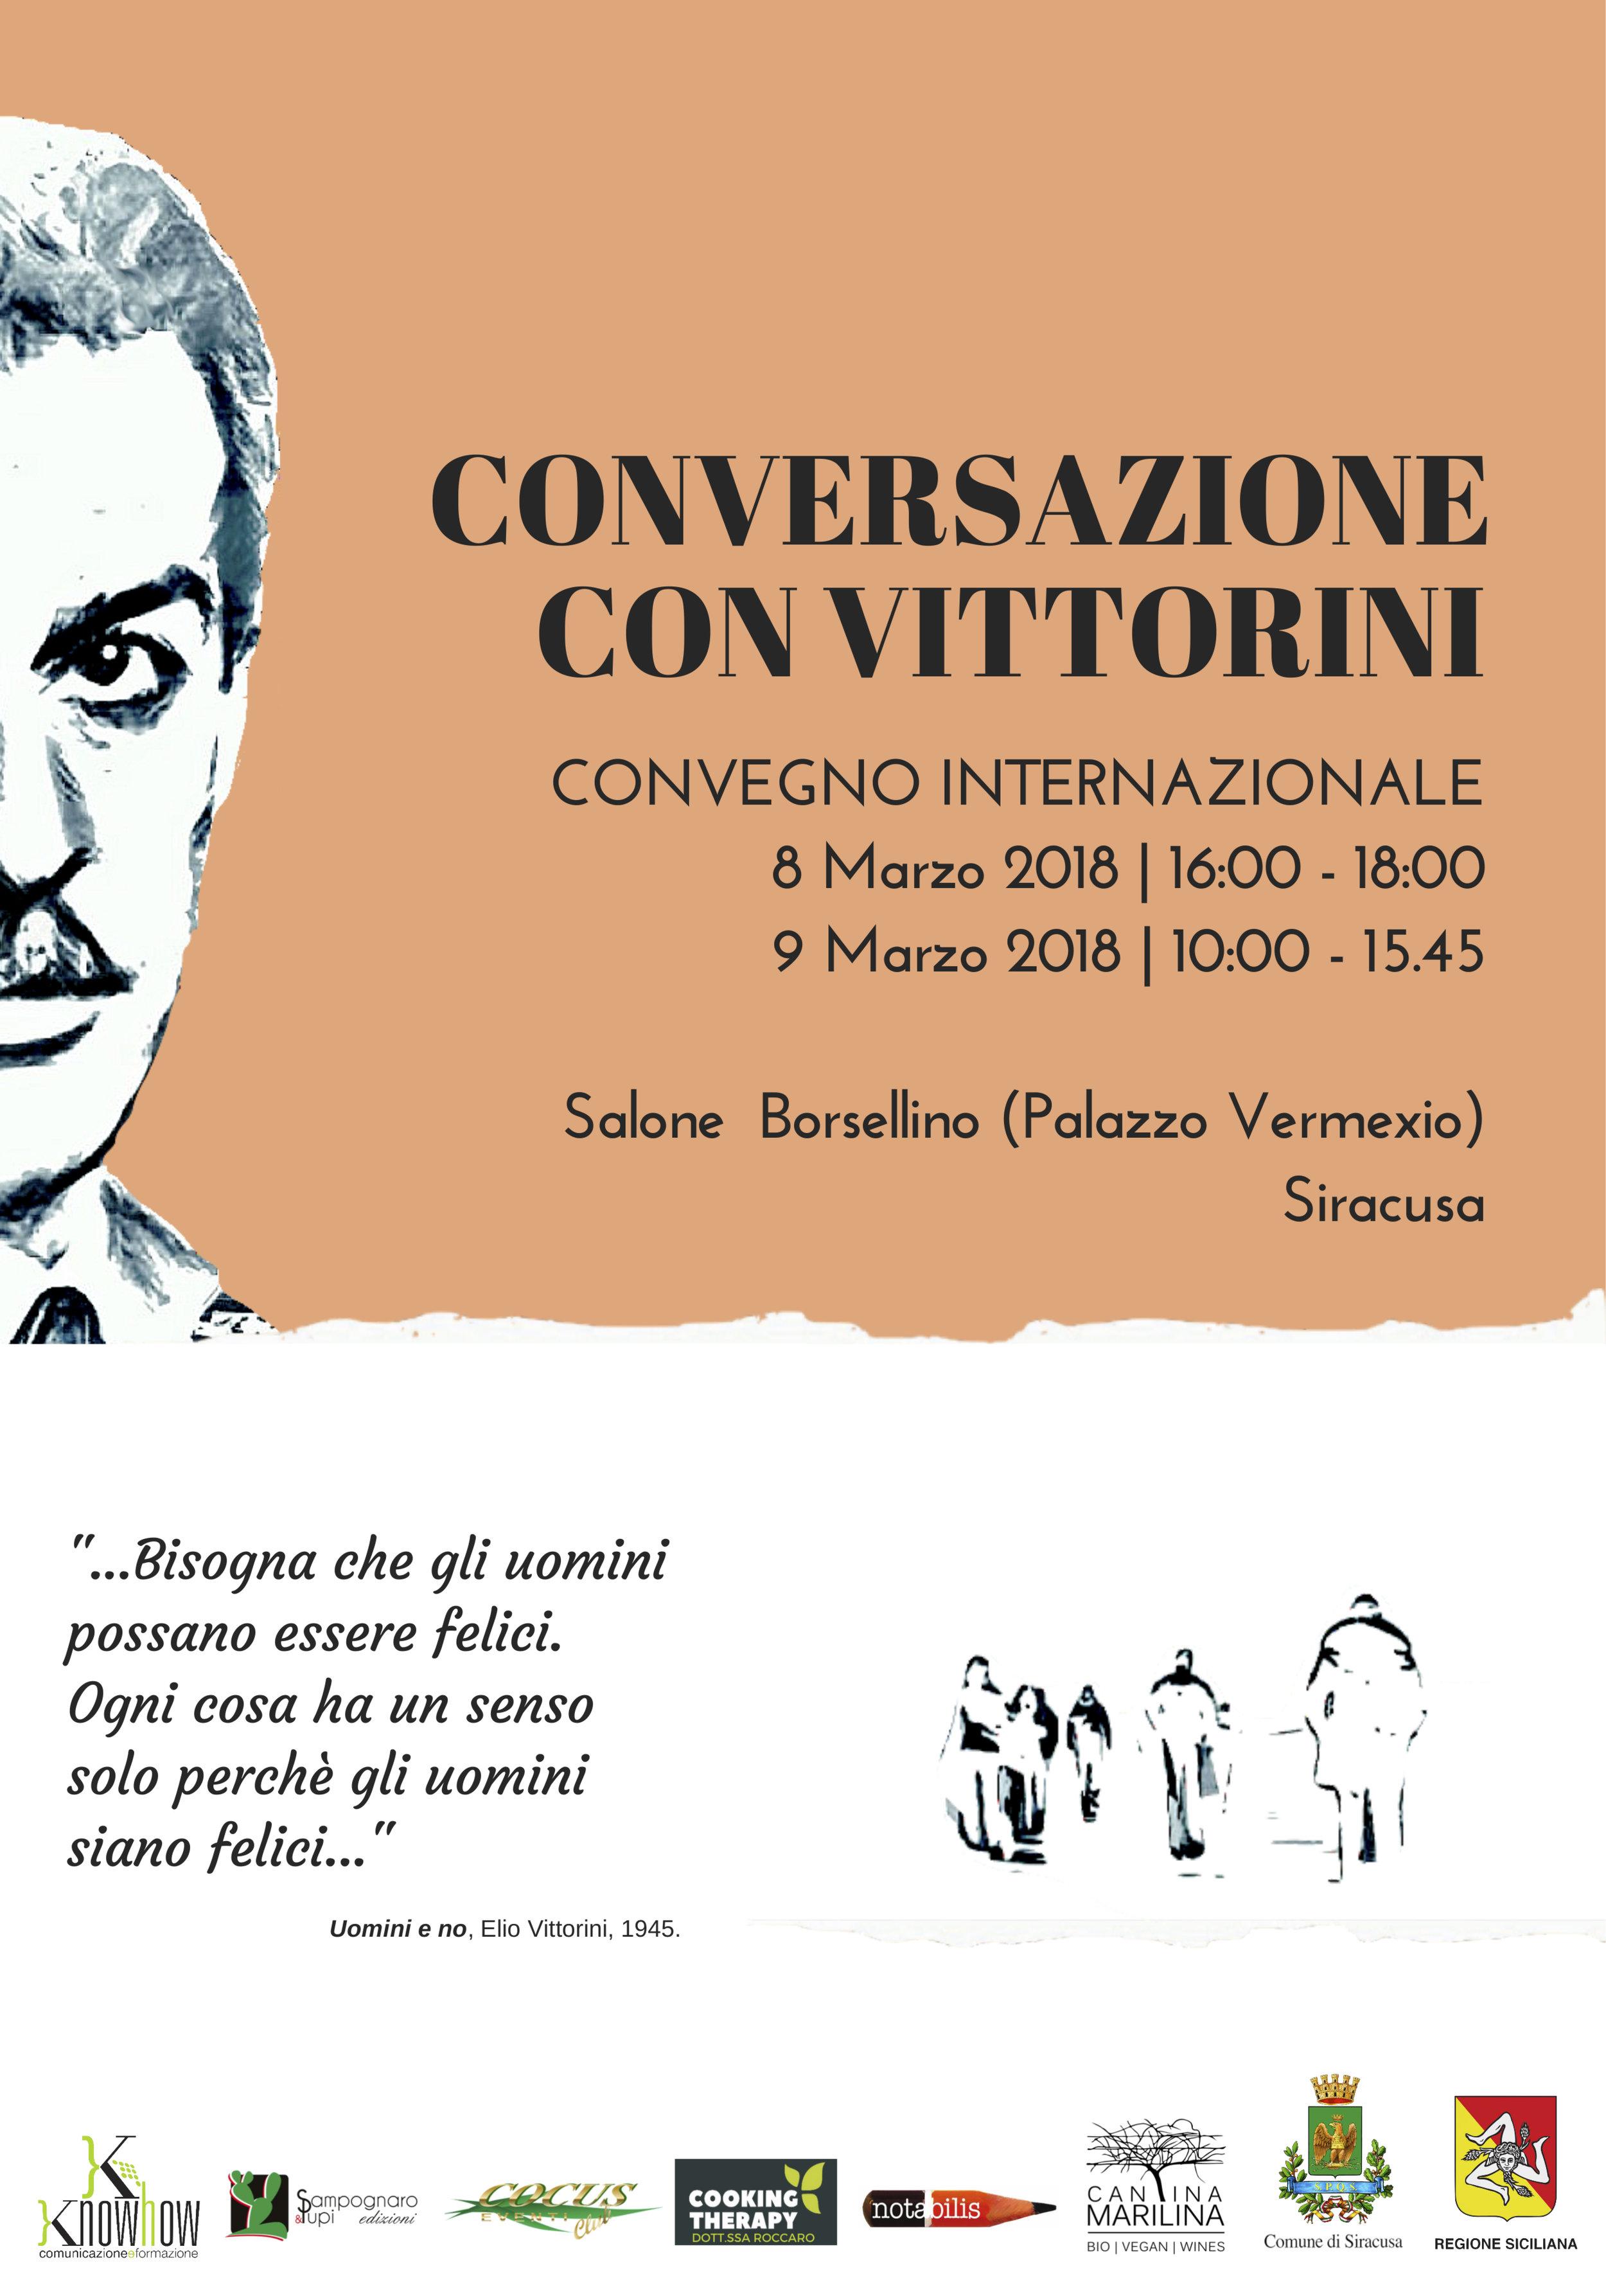 manifesto70x100jpg-1579711213.jpg